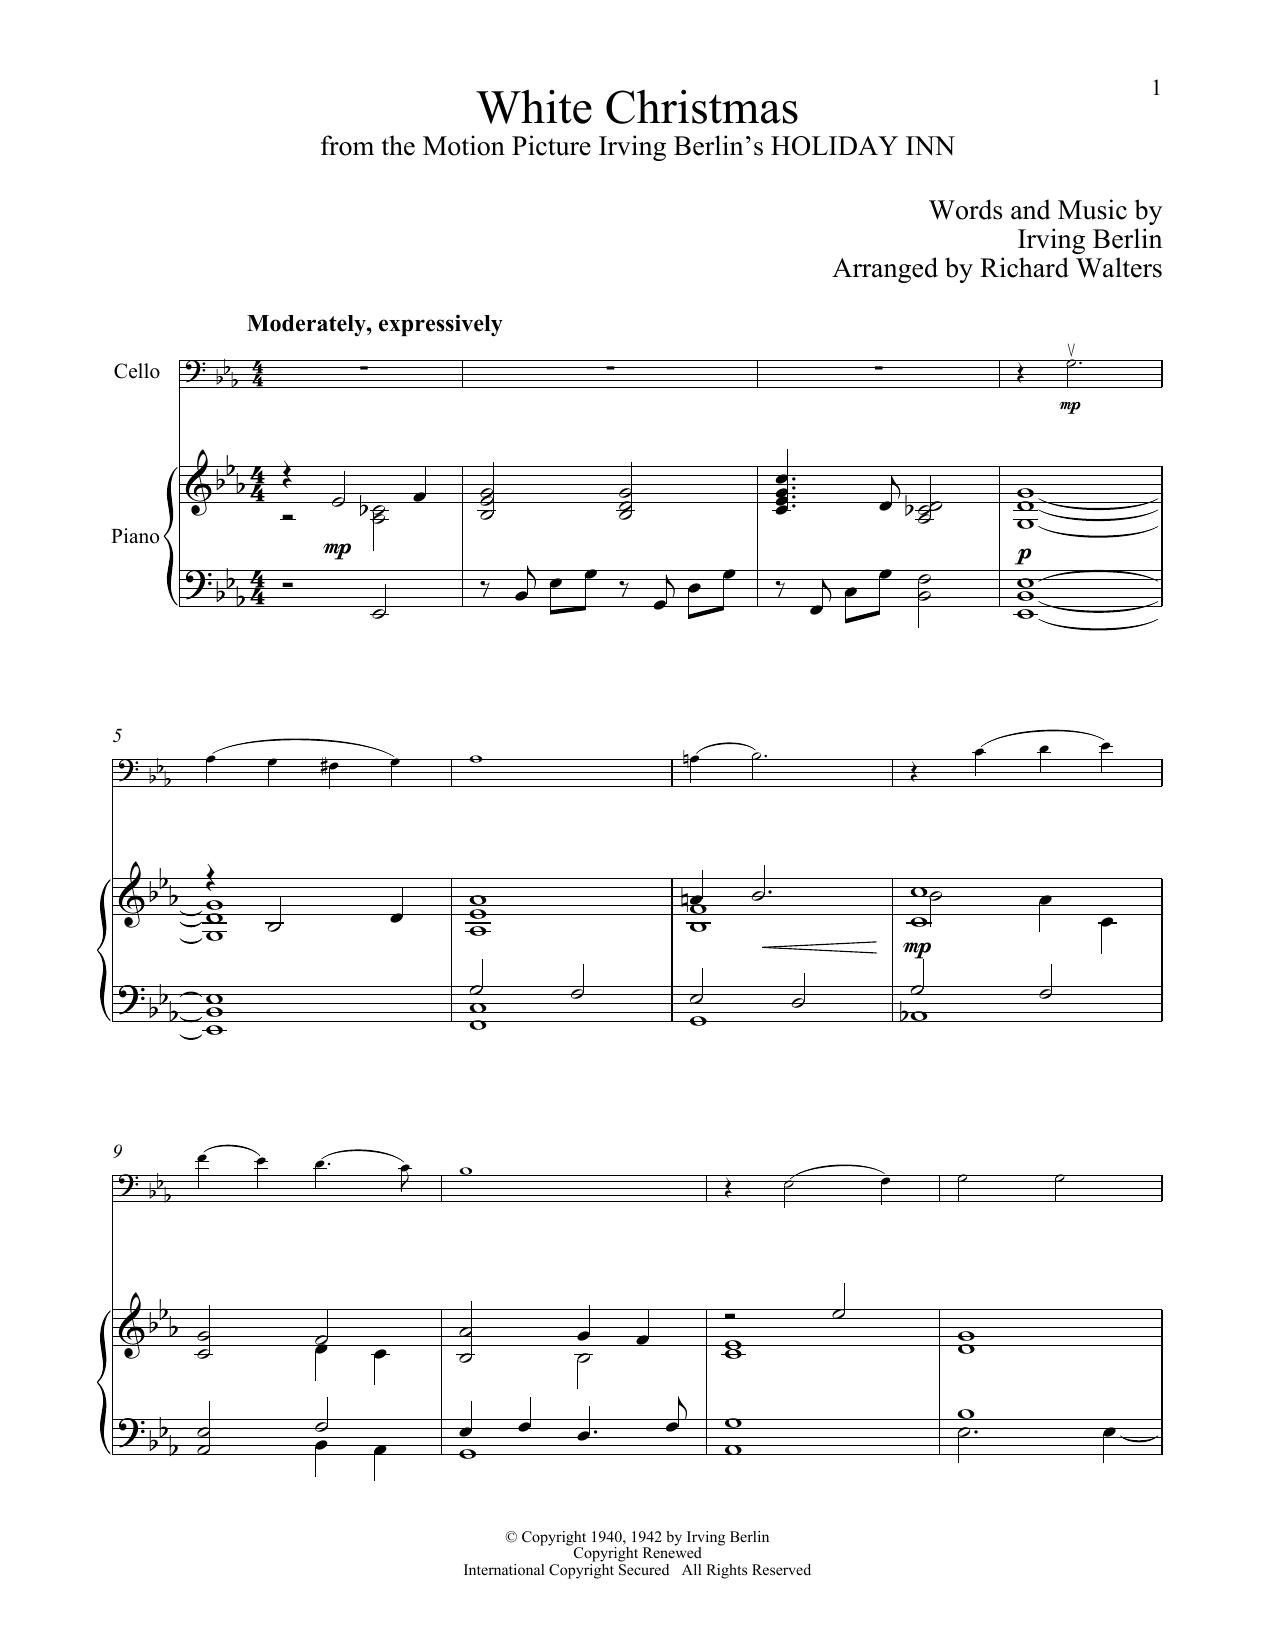 White Christmas (Cello and Piano)